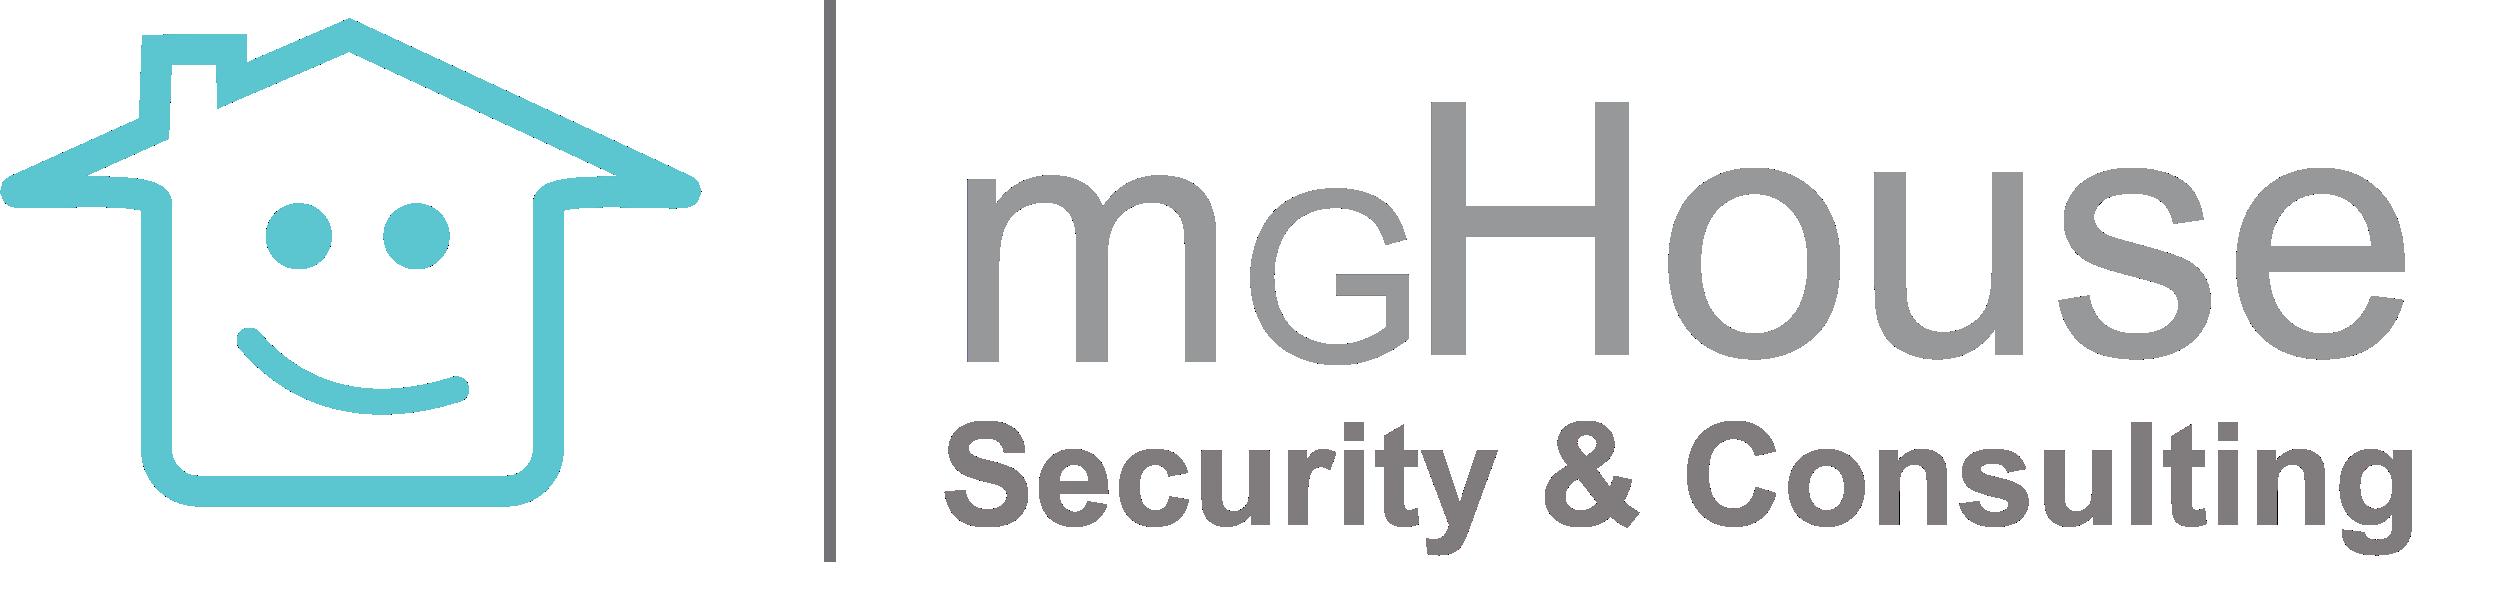 MG House Security Logo